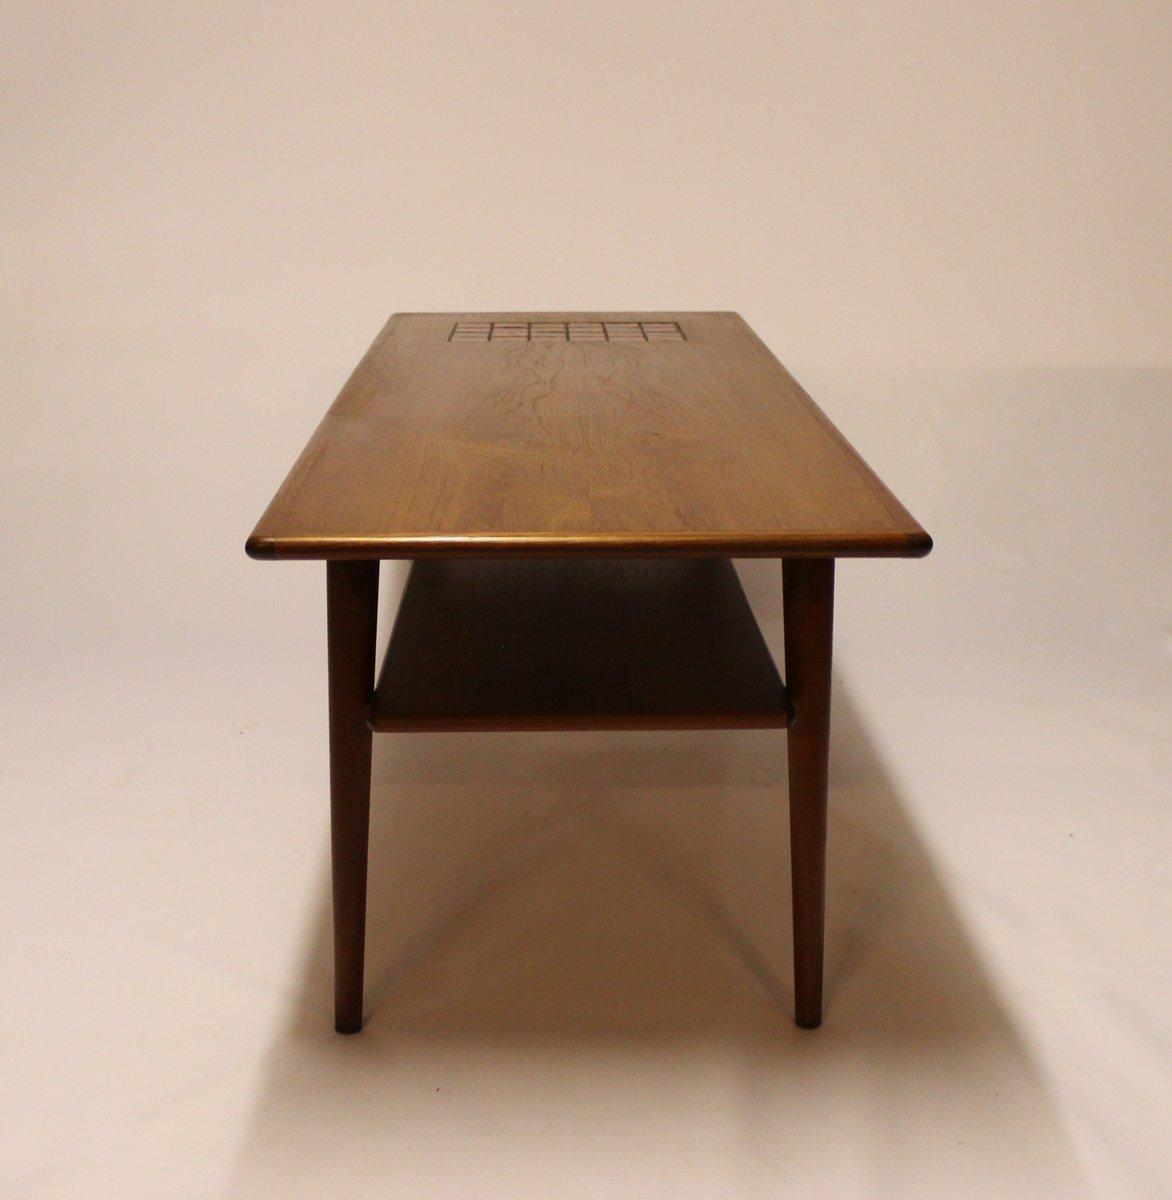 Dark Teak Coffee Table: Danish Teak Coffee Table With Dark-Colored Tiles, 1960s